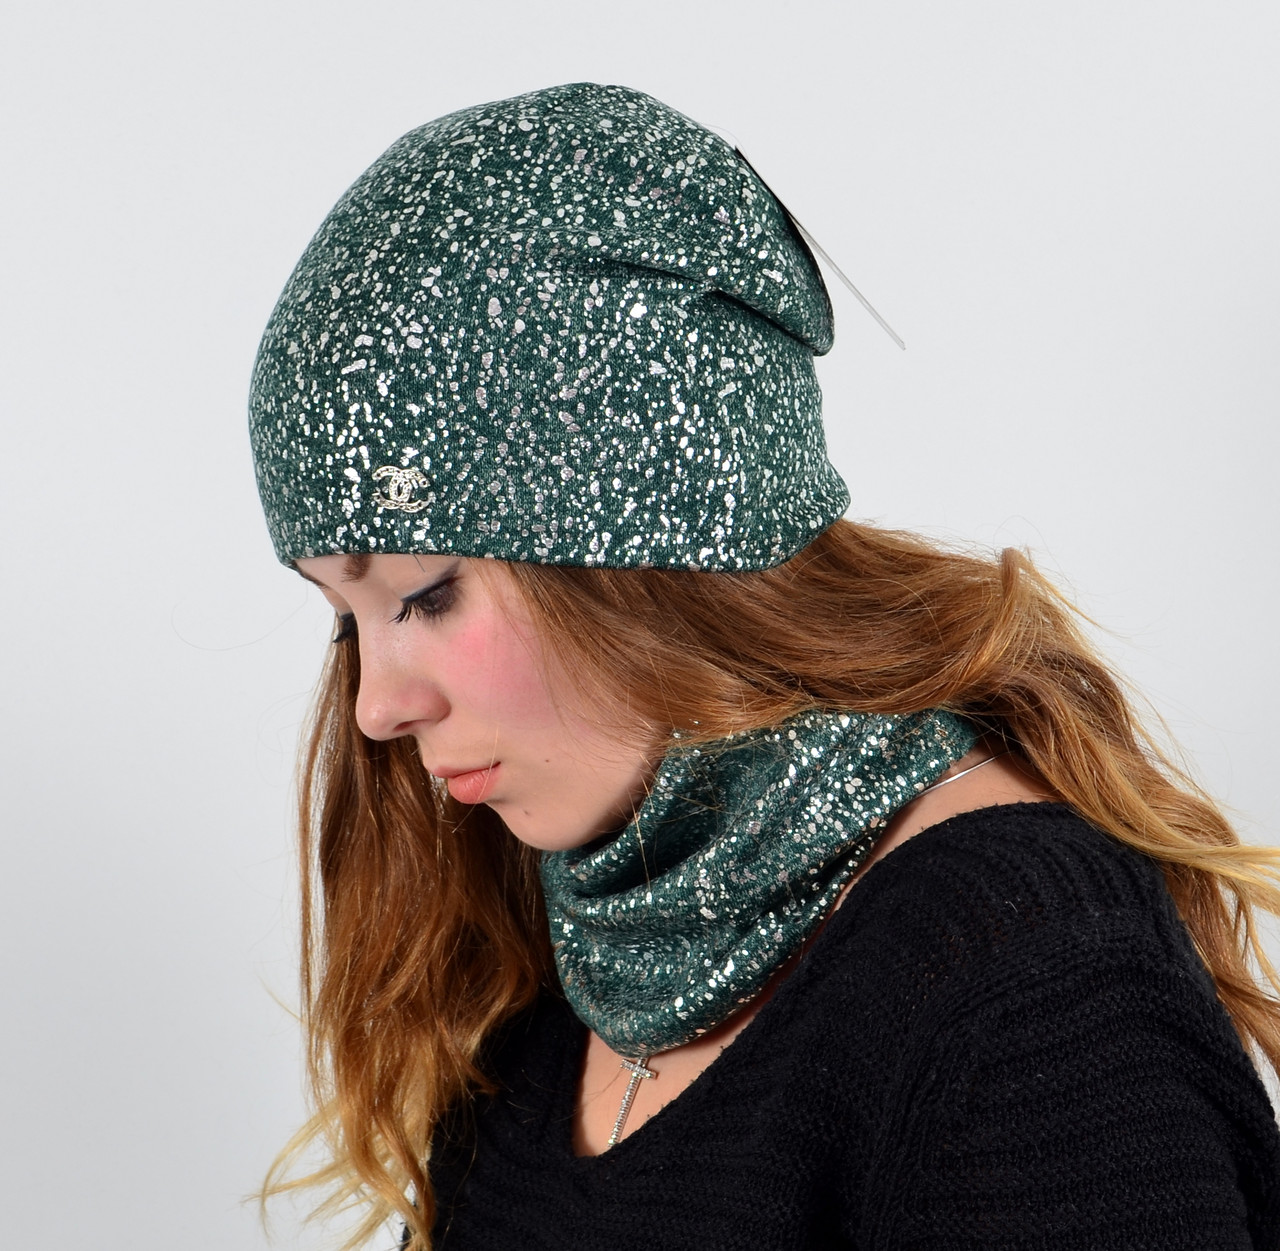 Трикотажный комплект(шапка+хомут) Глитер